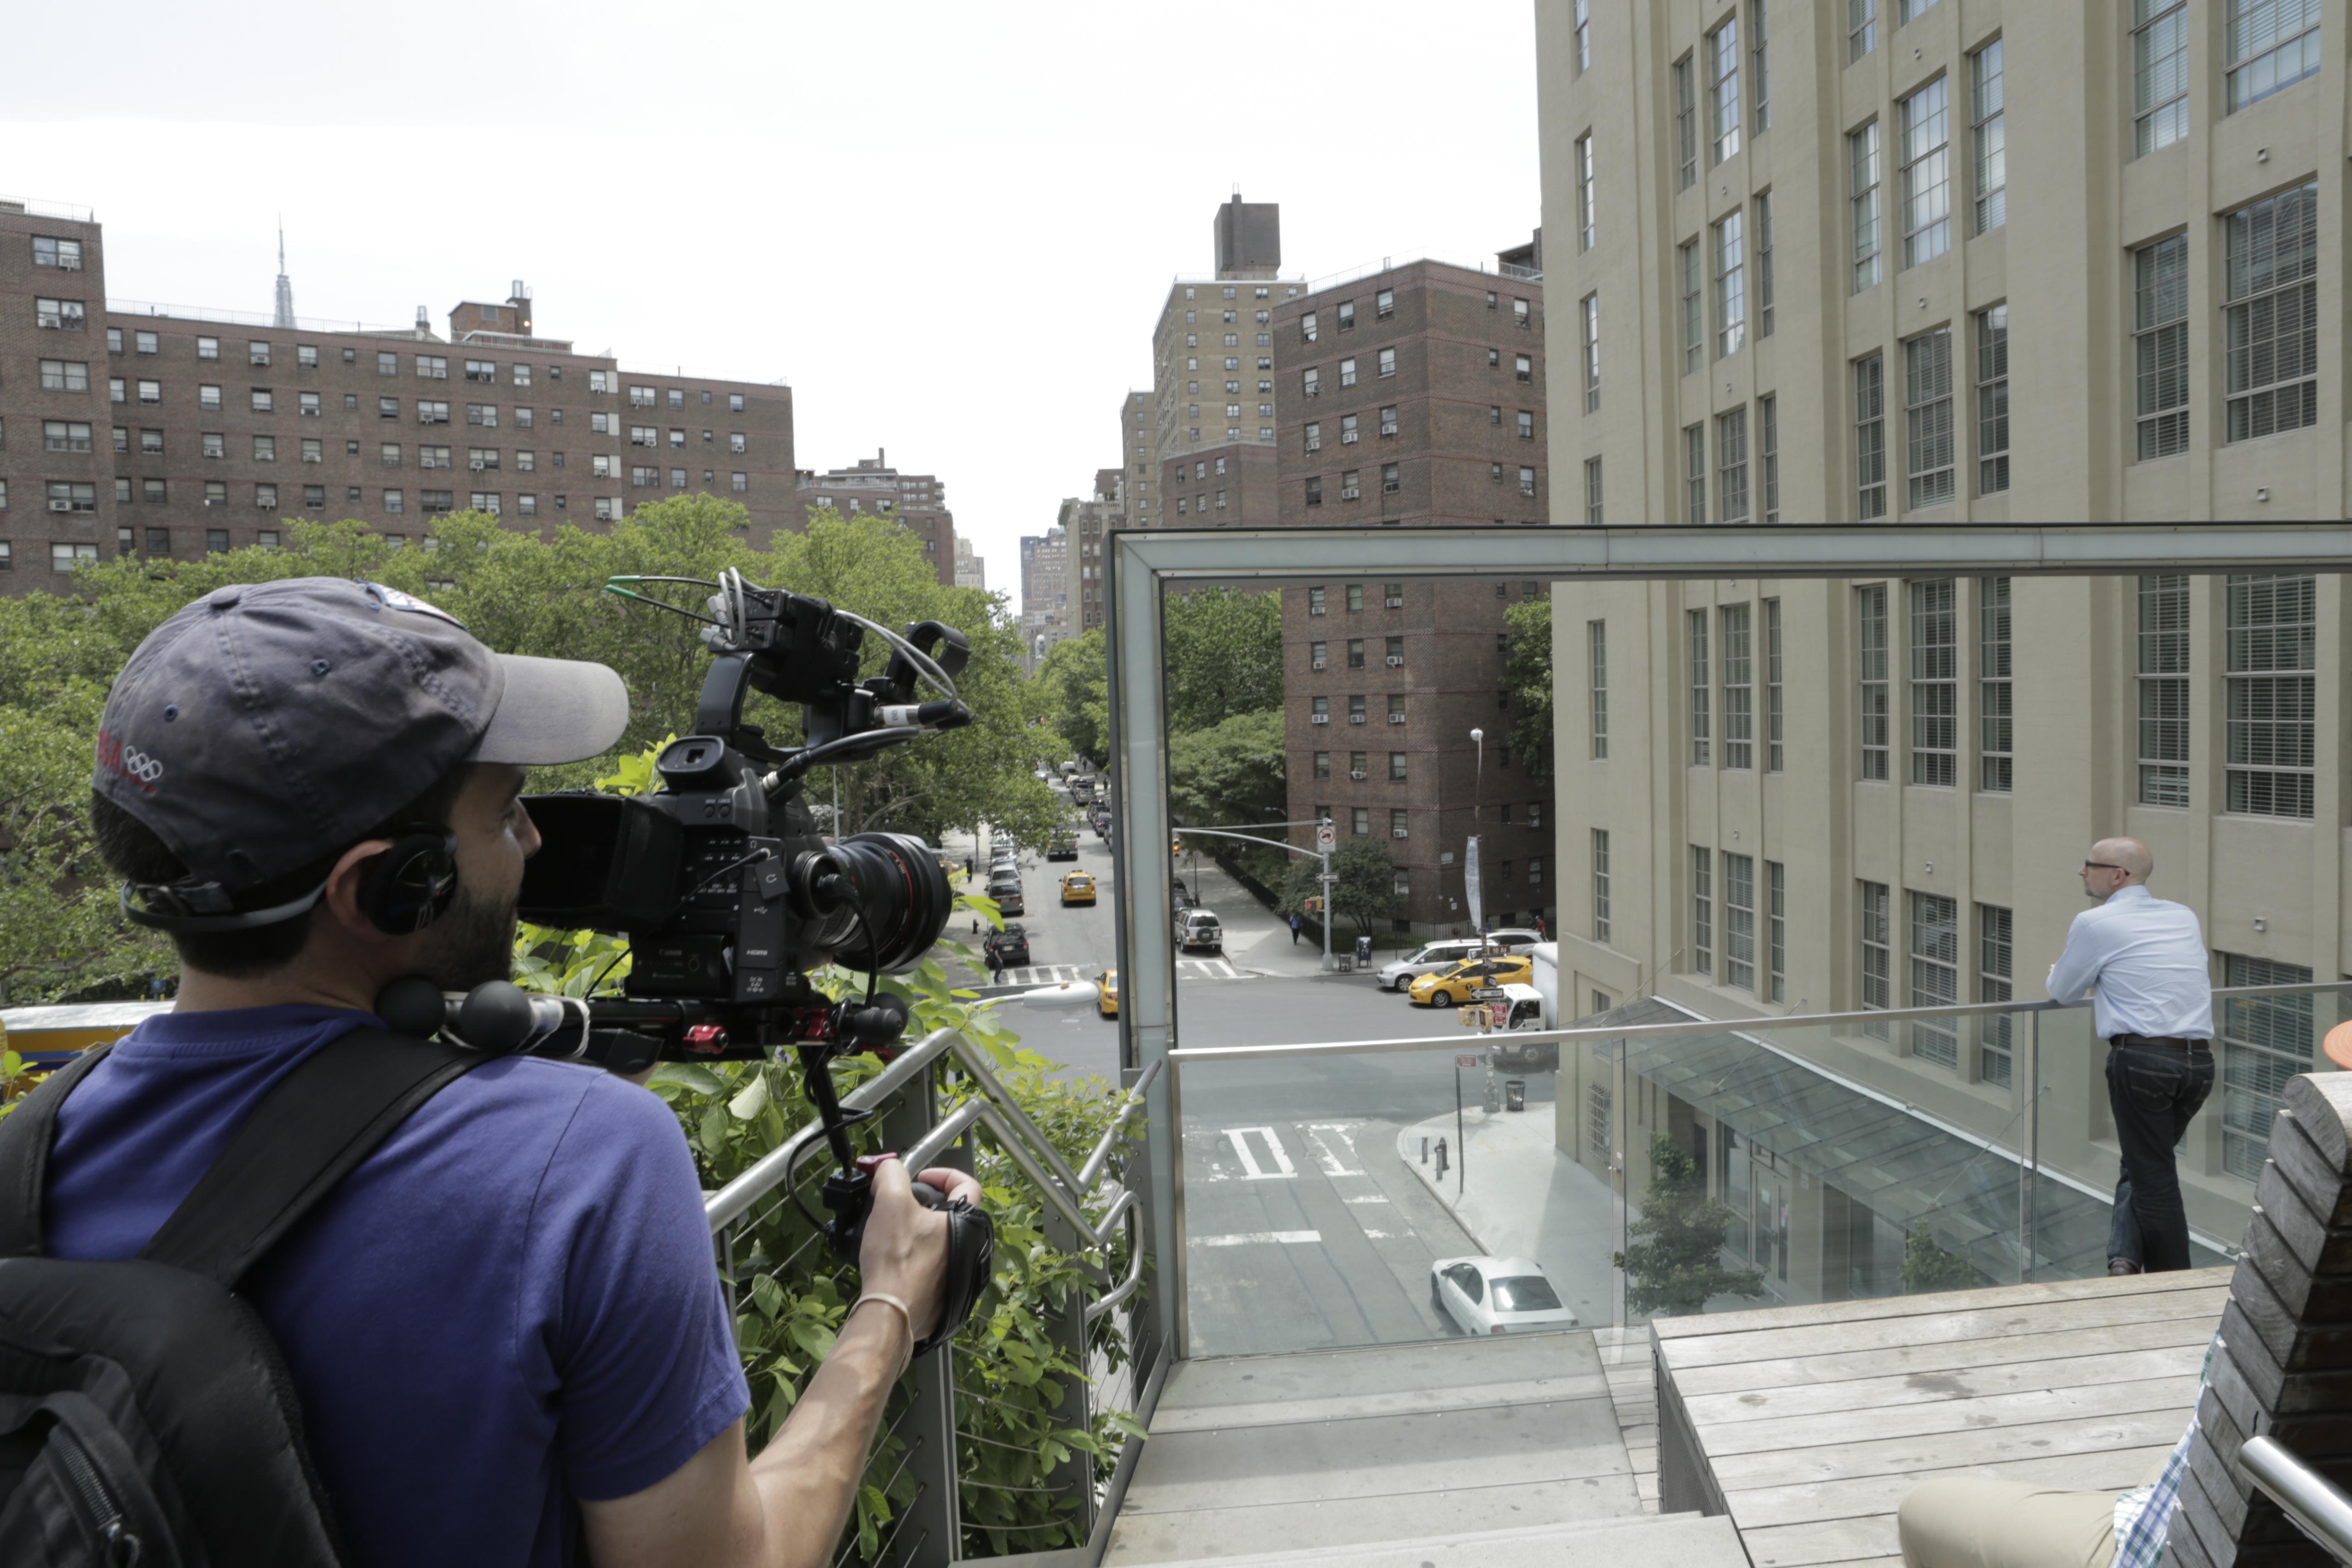 Dan films Josh on the High Line